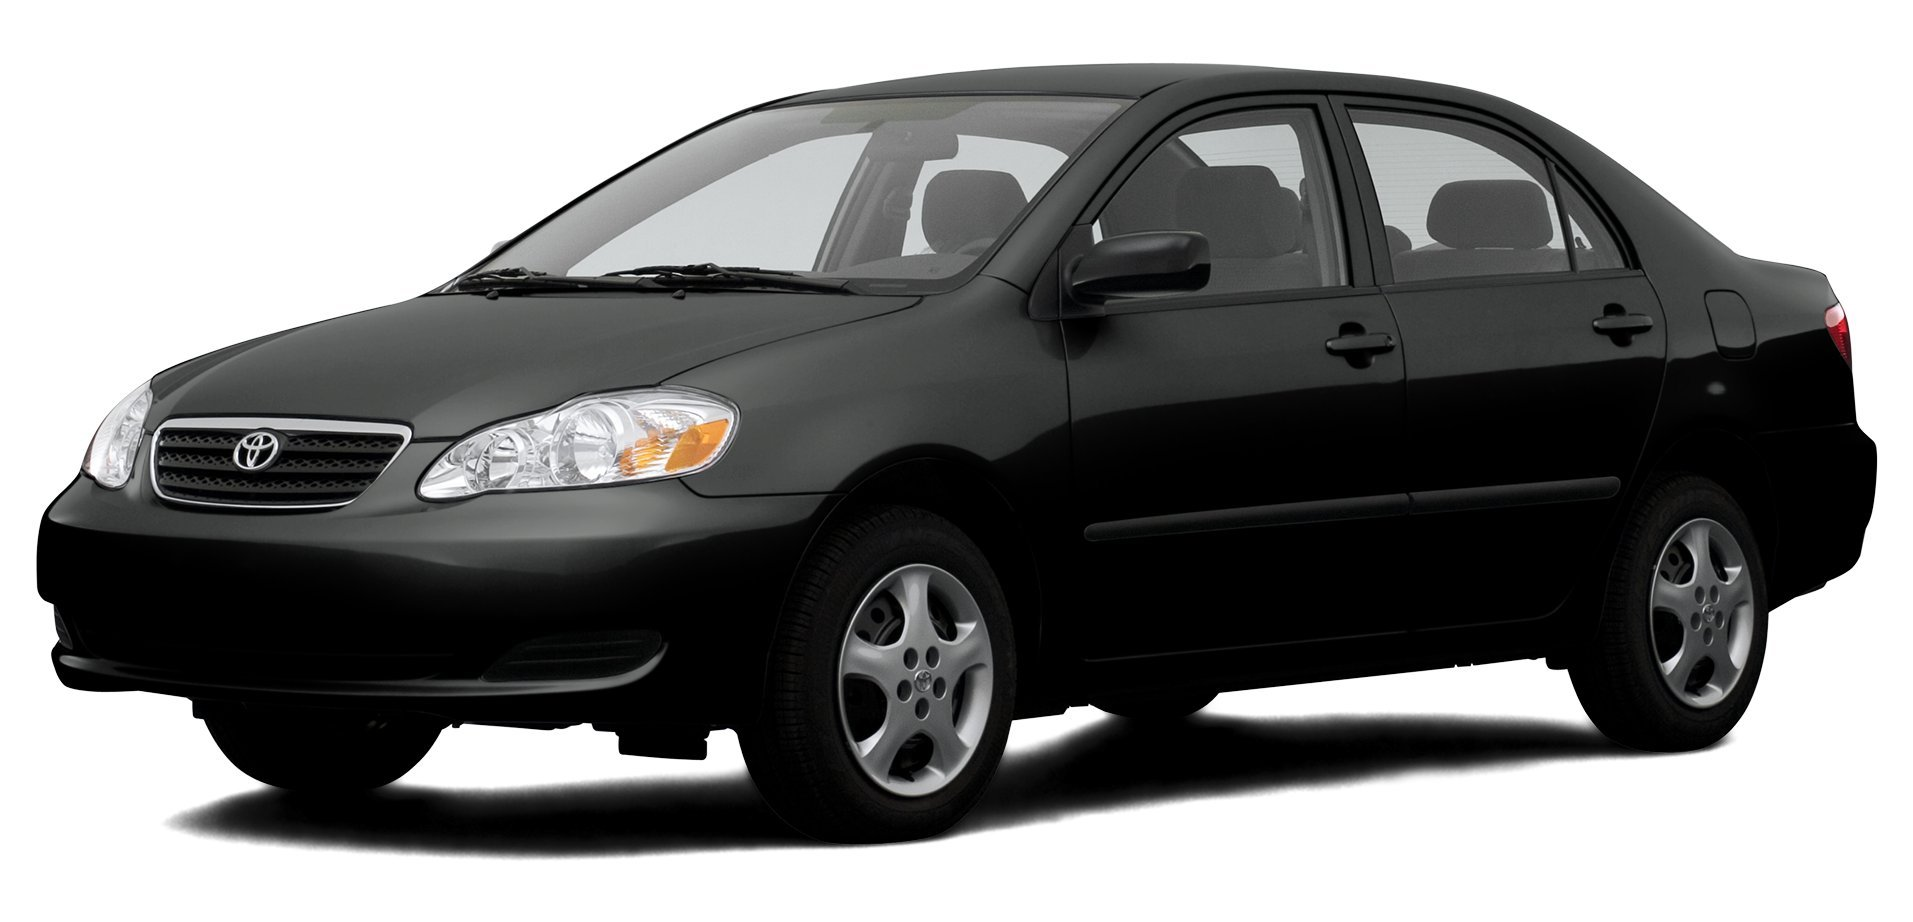 Kekurangan Toyota Corolla 2007 Tangguh